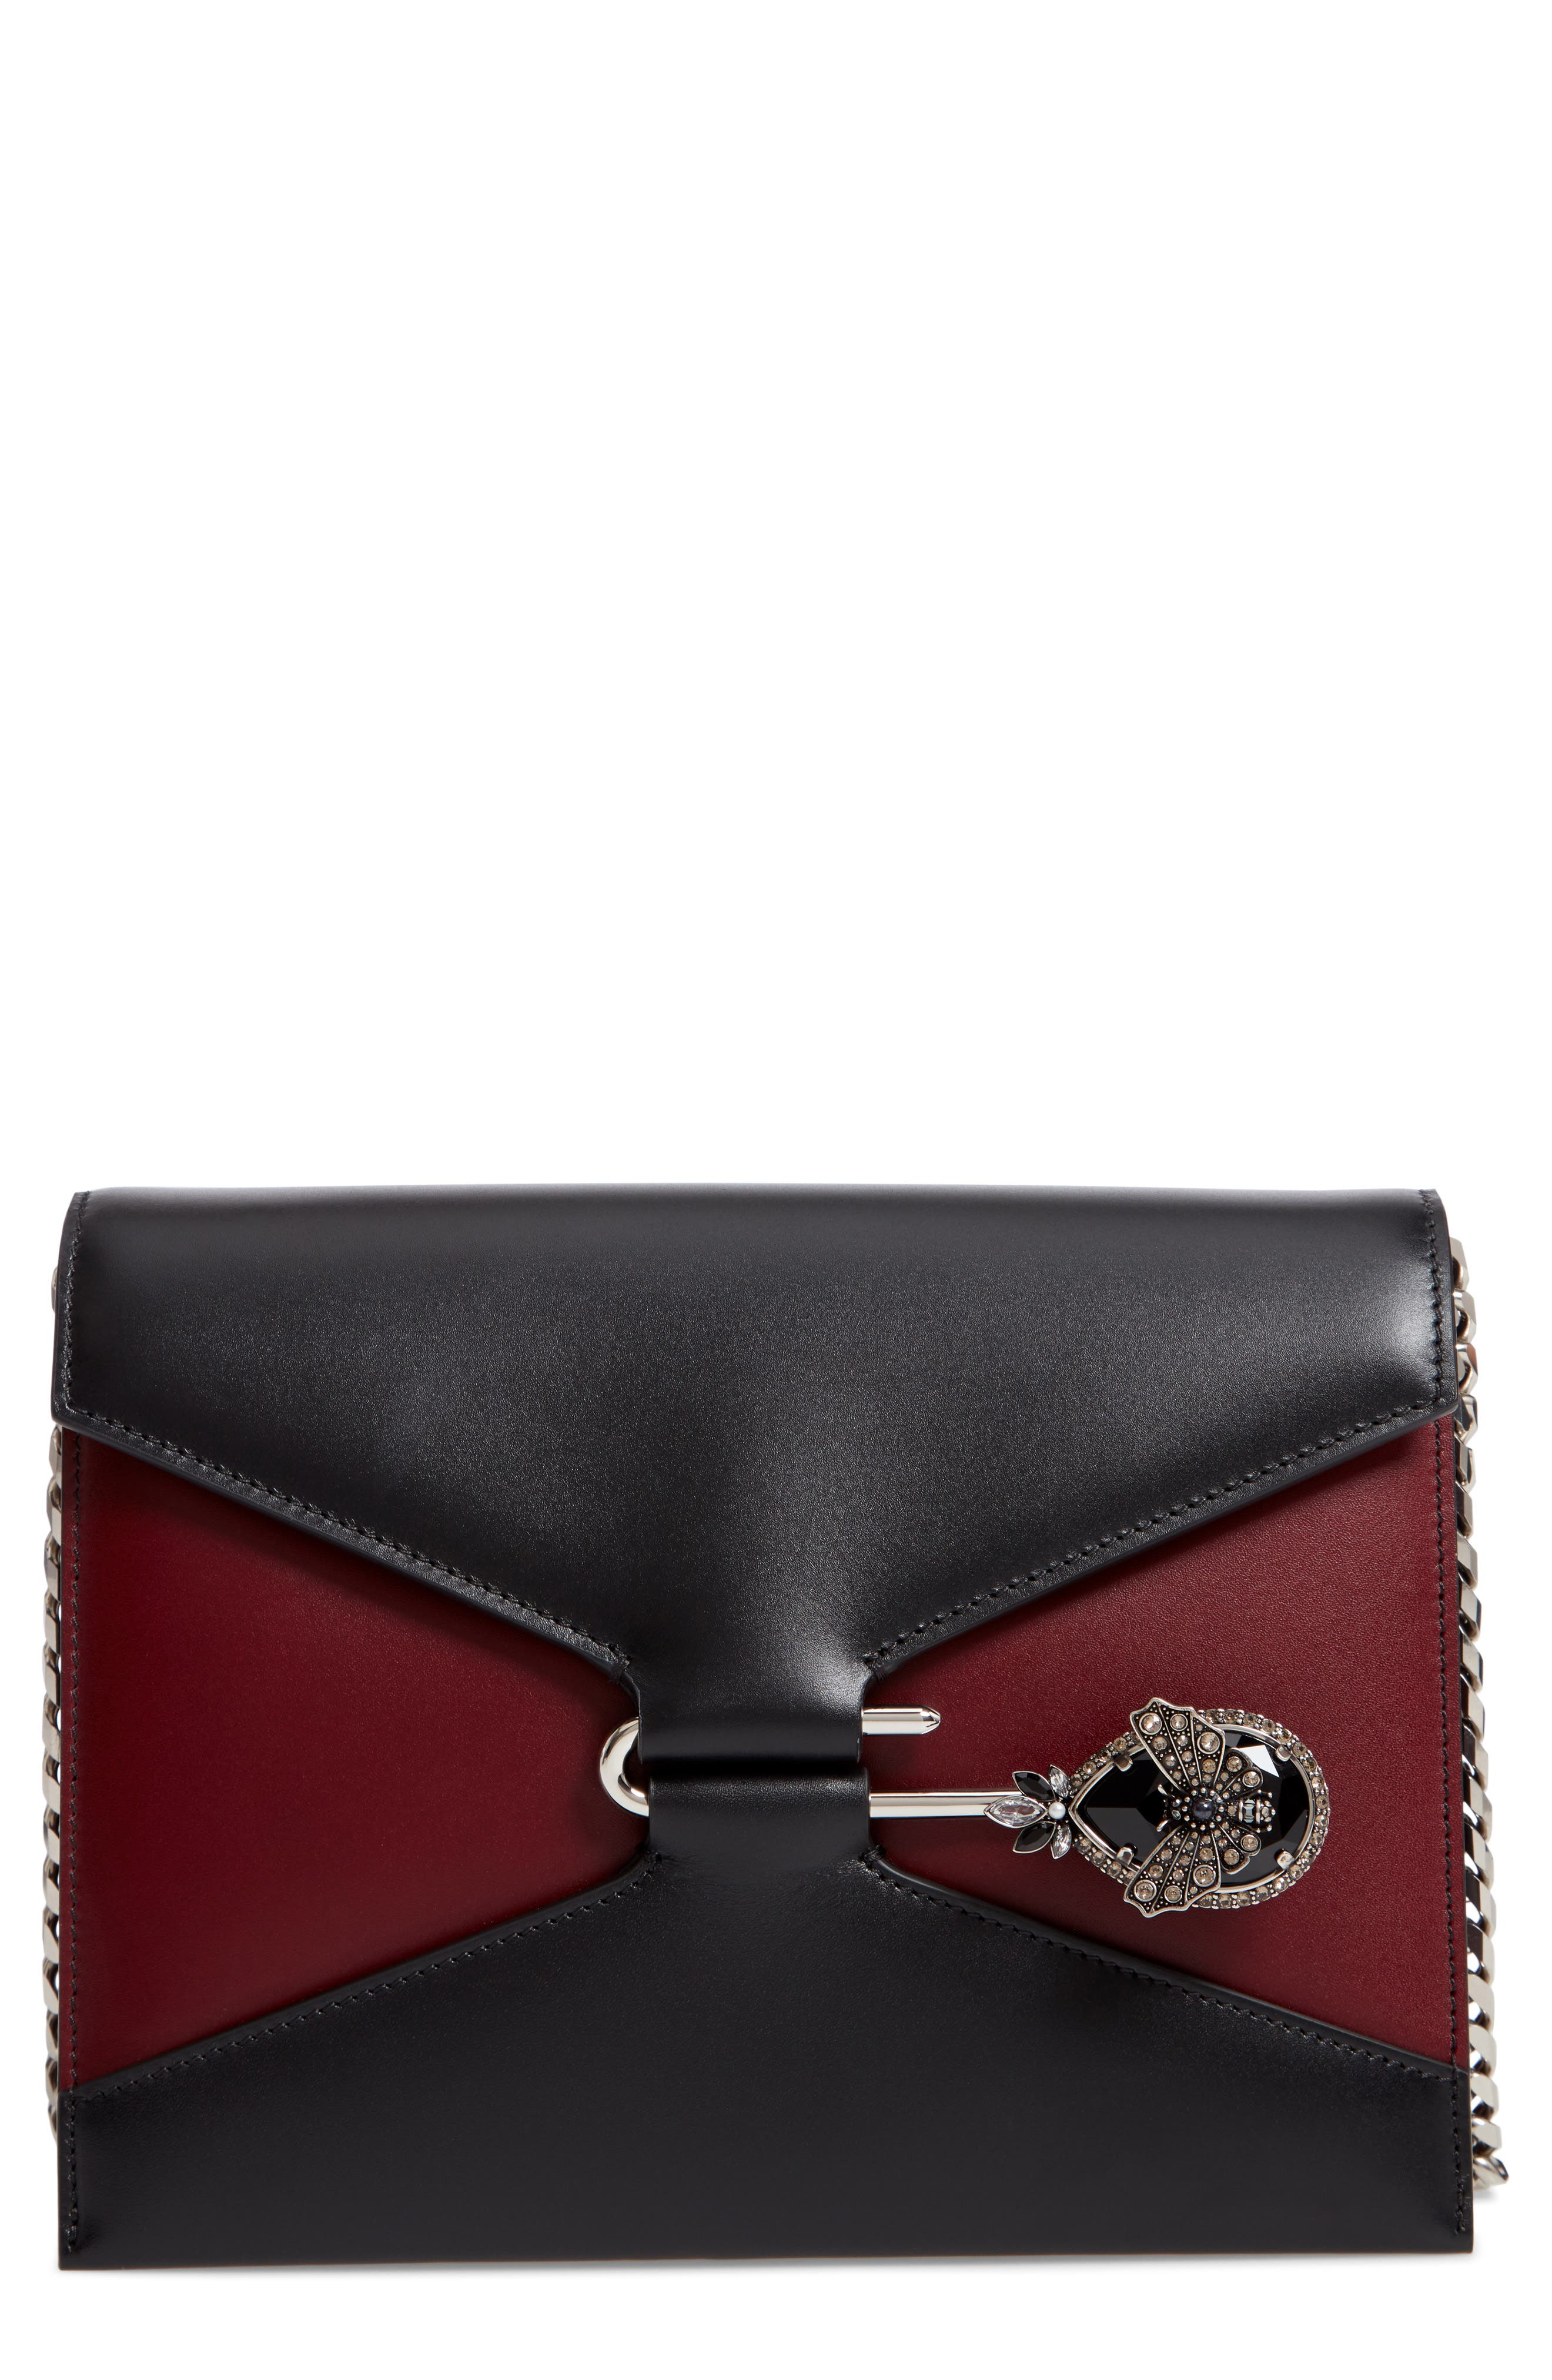 Pin Calfskin Leather Shoulder Bag,                             Main thumbnail 1, color,